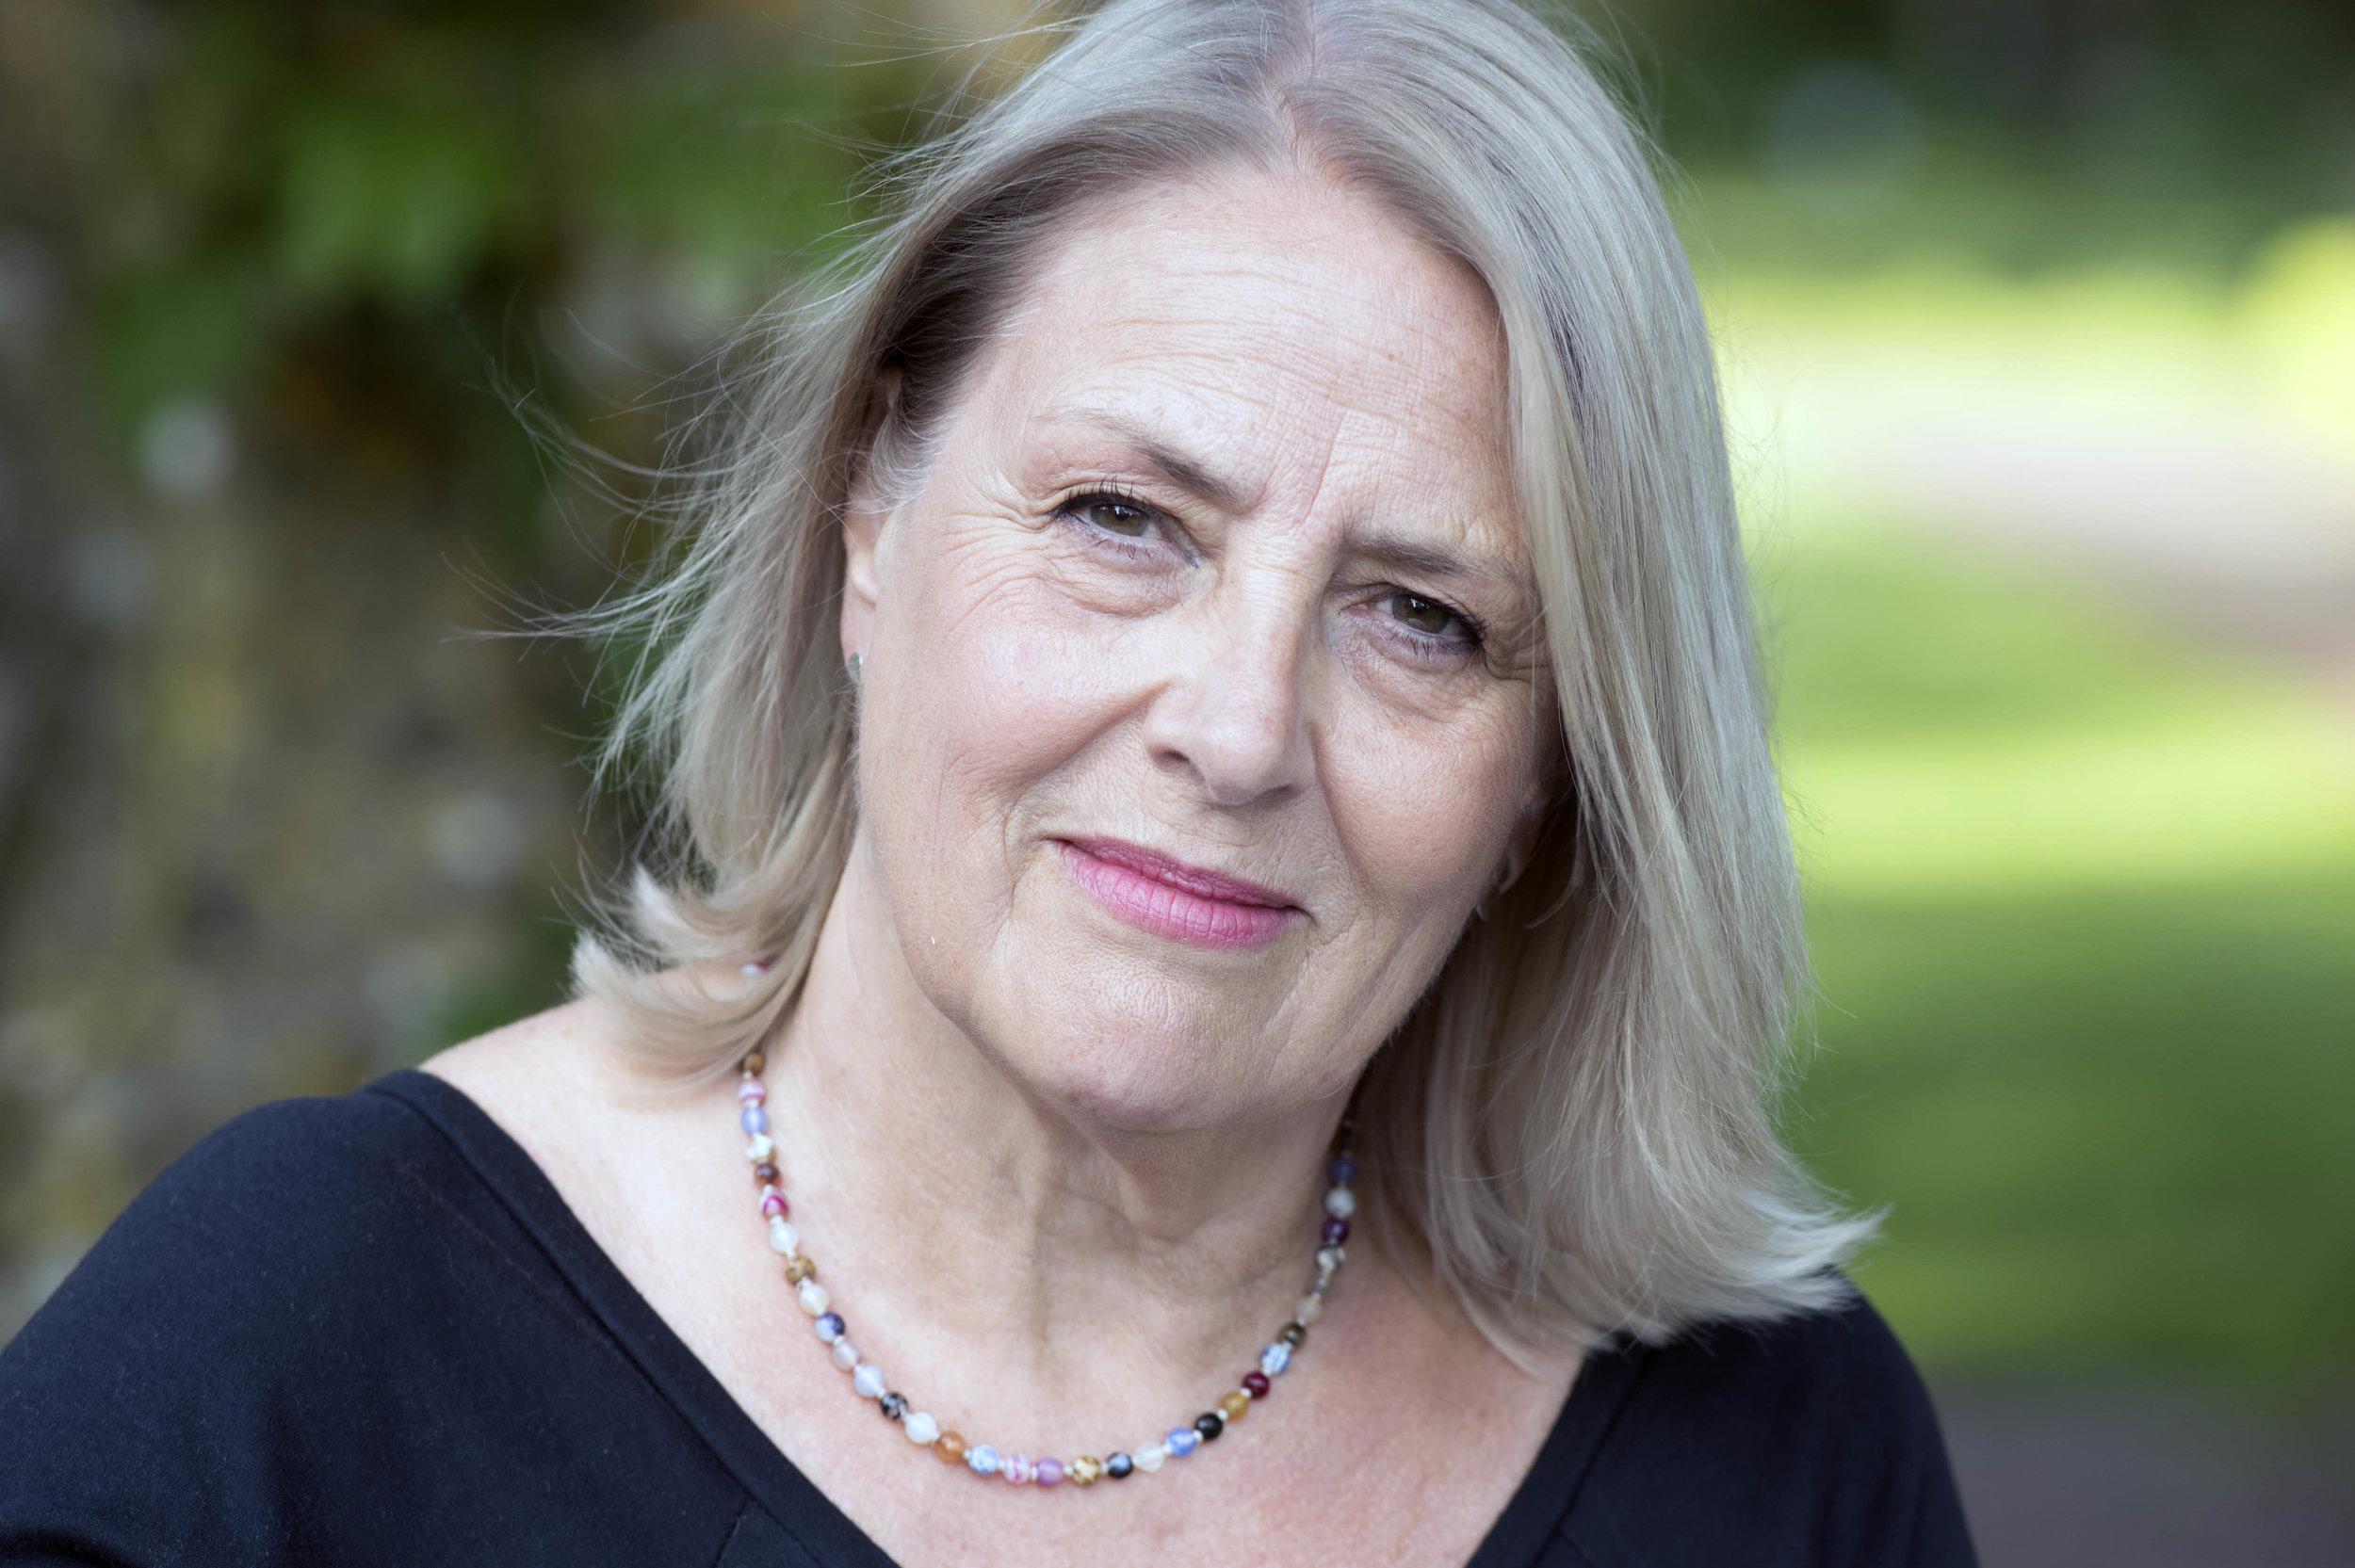 Lewes family and couples therapist Angela Betteridge